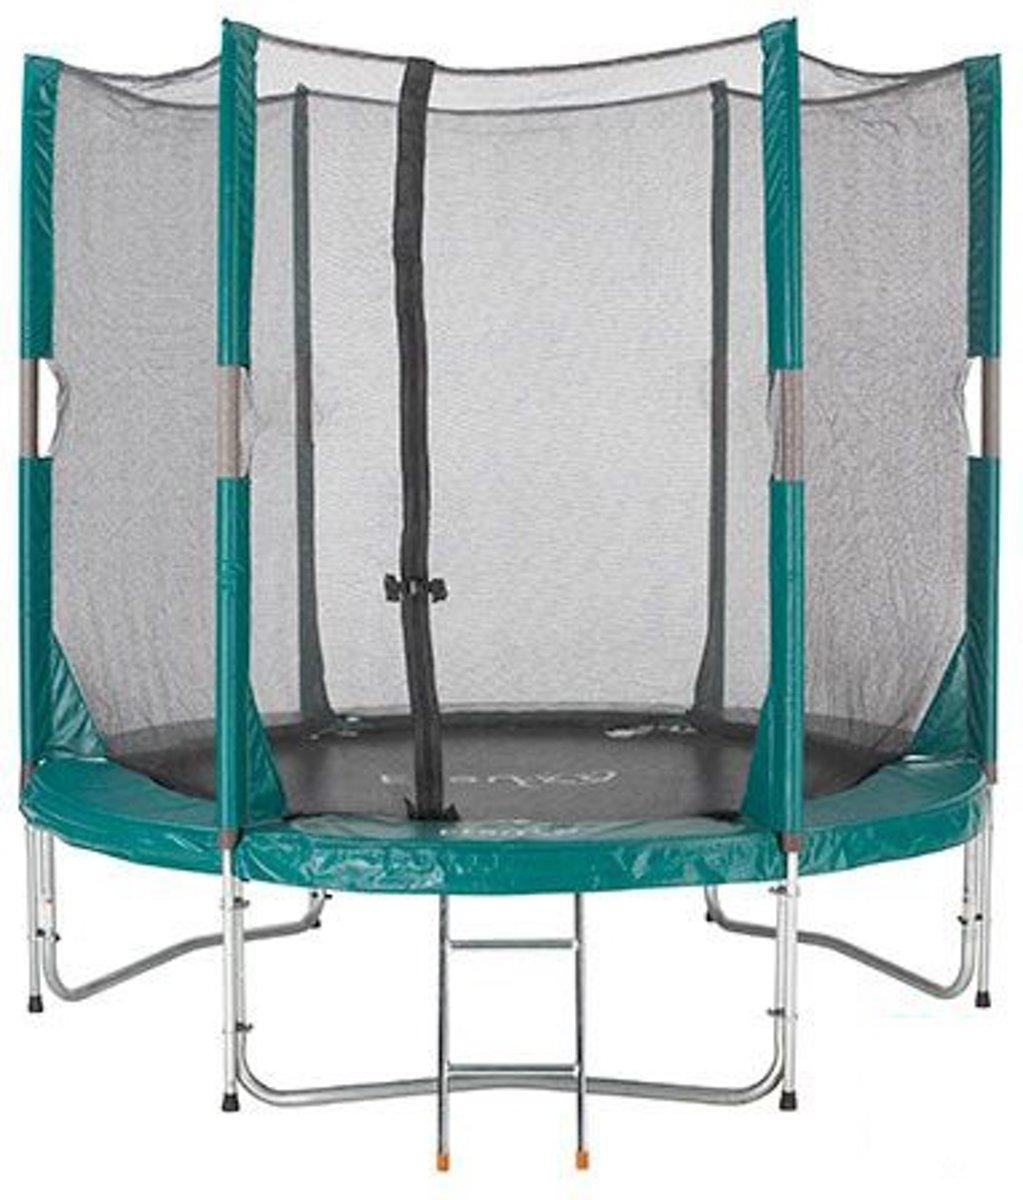 Etan Hi-Flyer Trampoline - 300 cm - Inclusief Veiligheidsnet